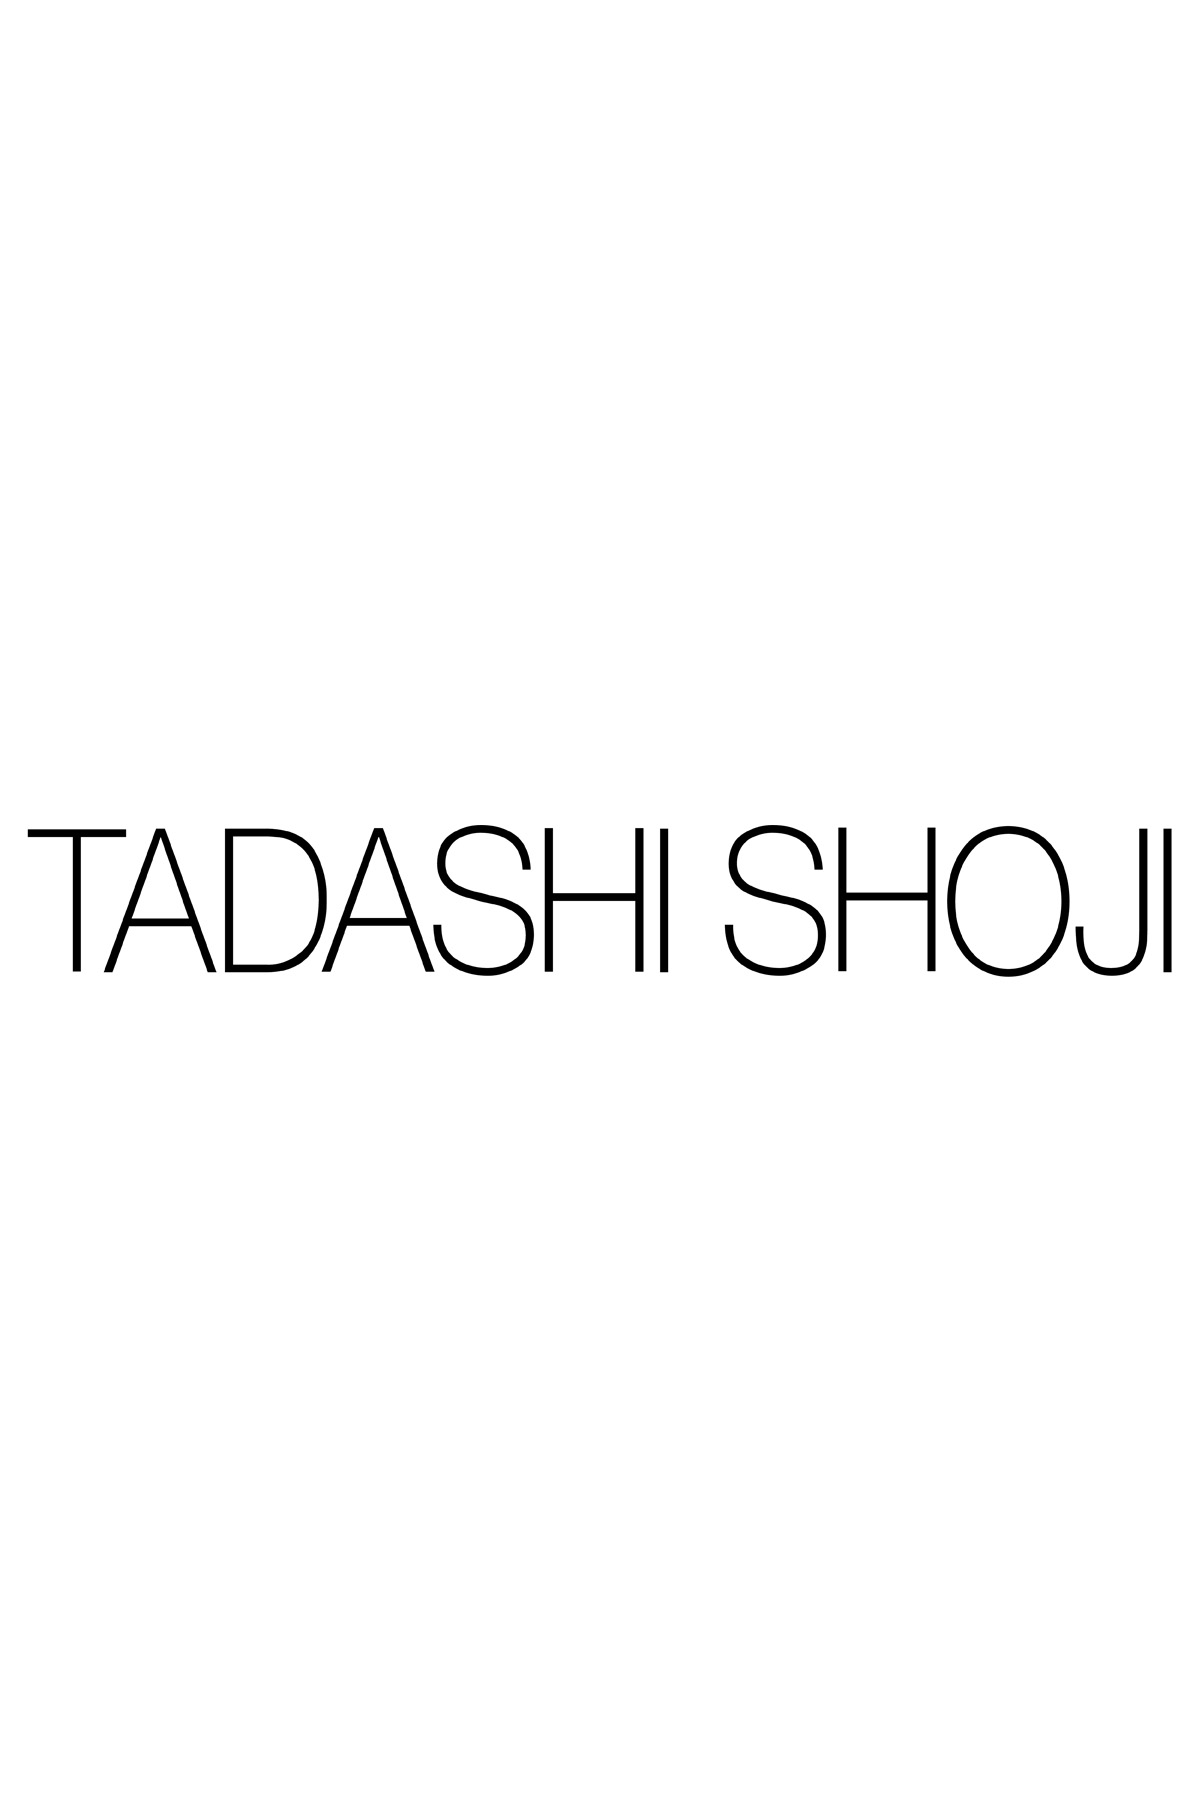 Tadashi Shoji - Coiled Embroidery on Tulle Jacket - Detail